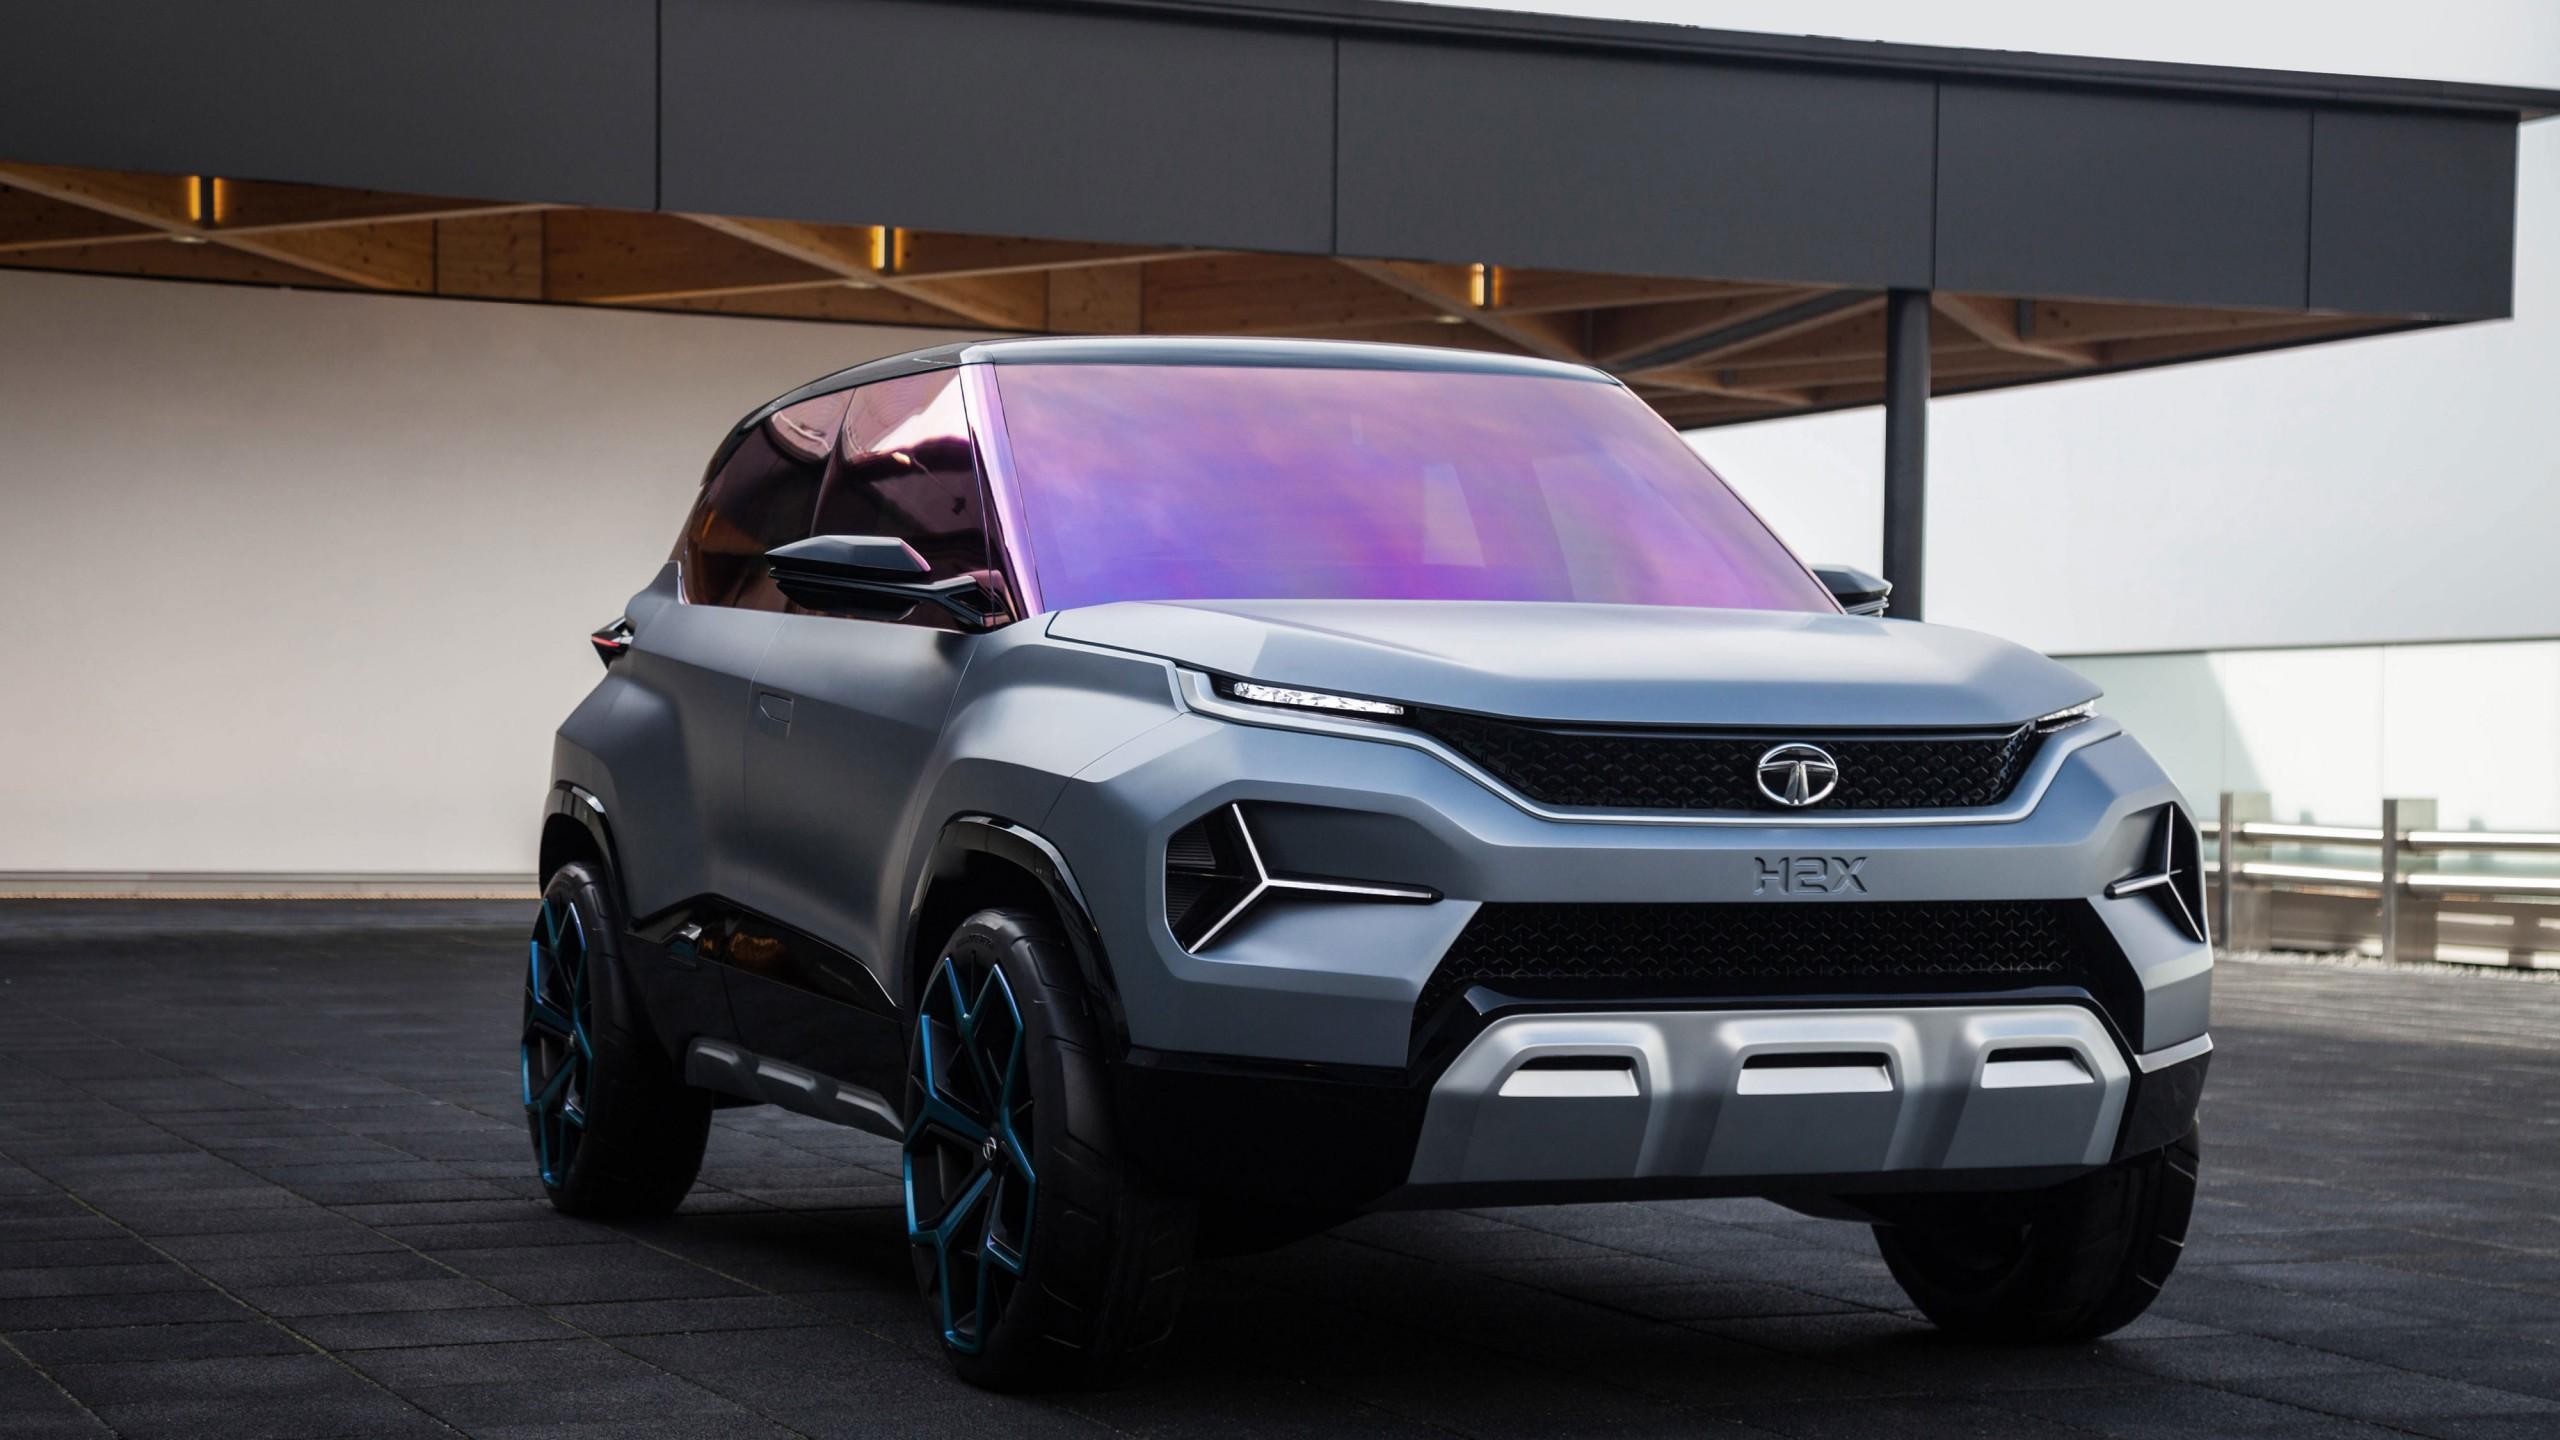 Wallpaper Tata H2x  Geneva Motor Show 2019  Suv  4k  Cars